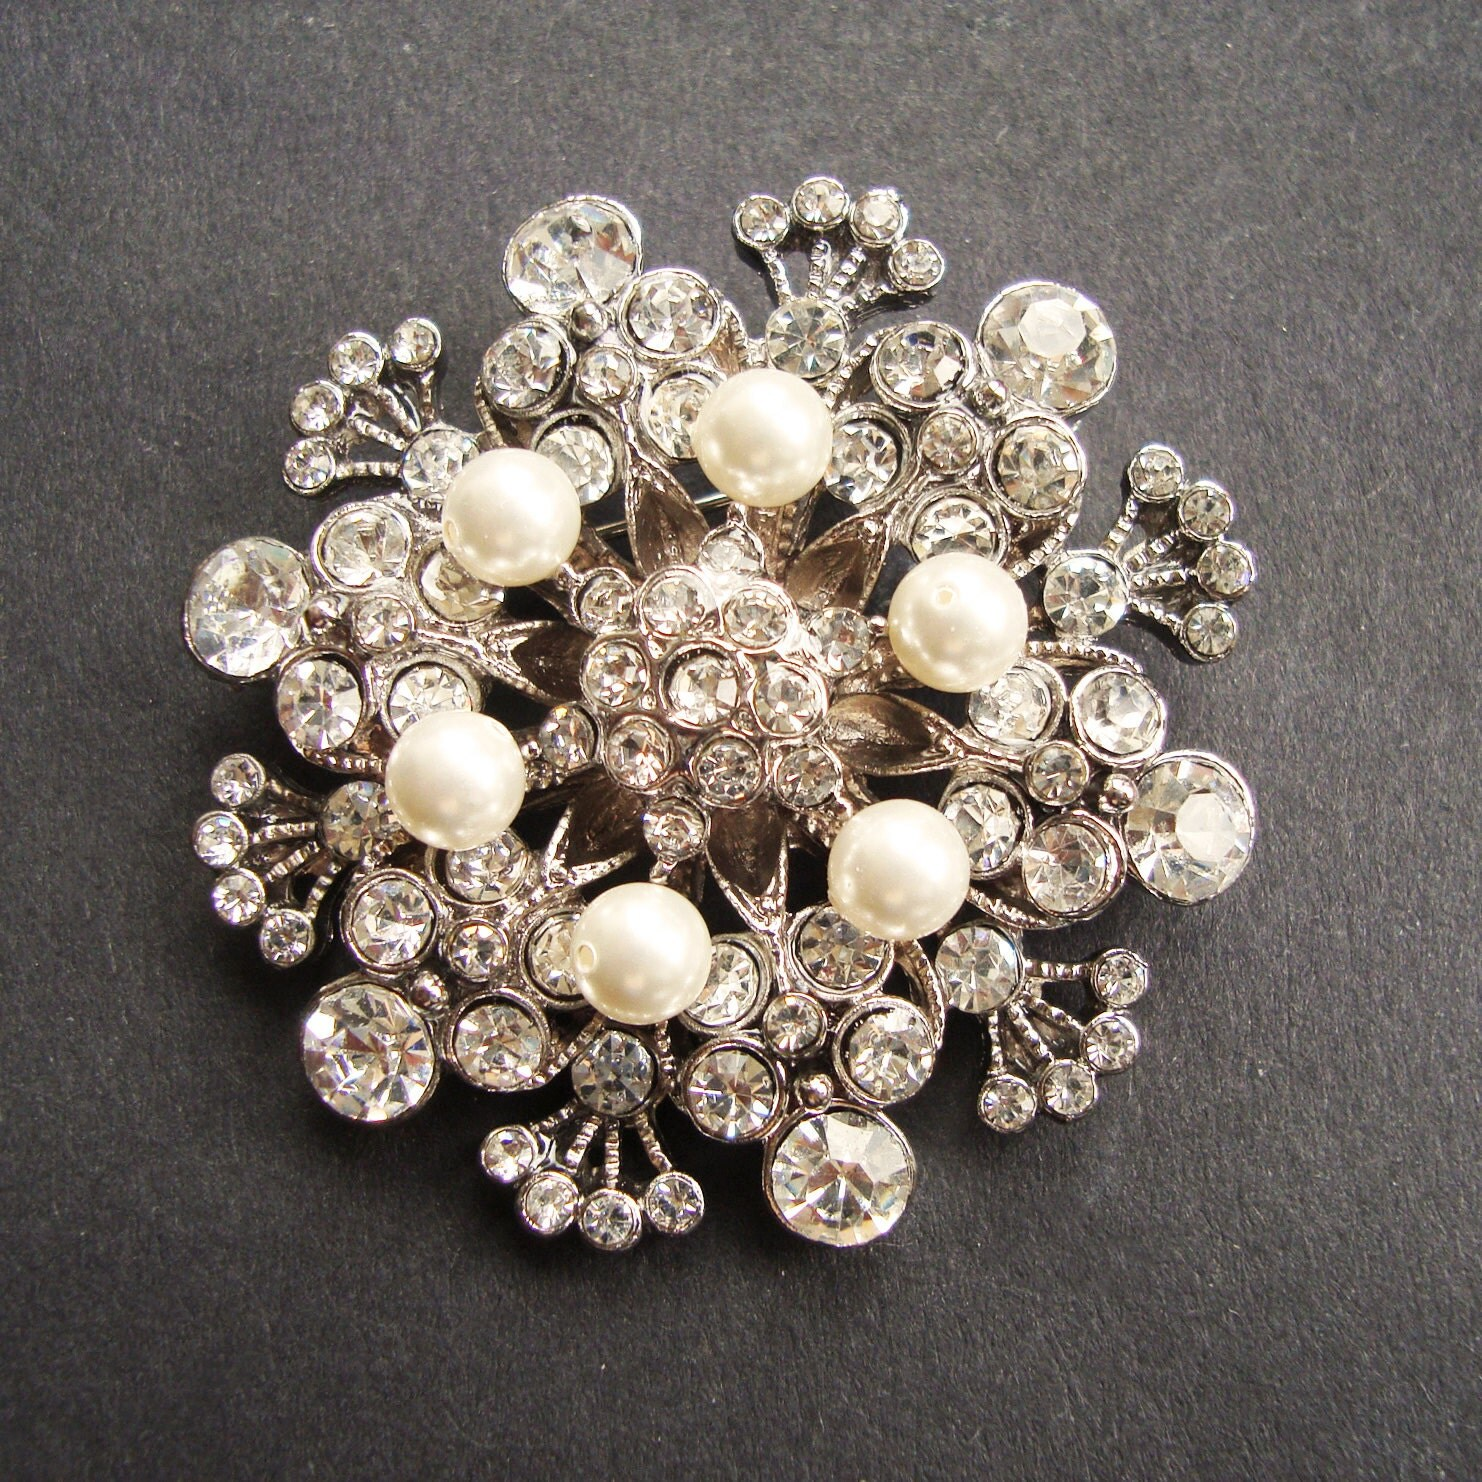 Vintage Style Wedding Bridal Brooch Pearl Bridal Sash Brooch